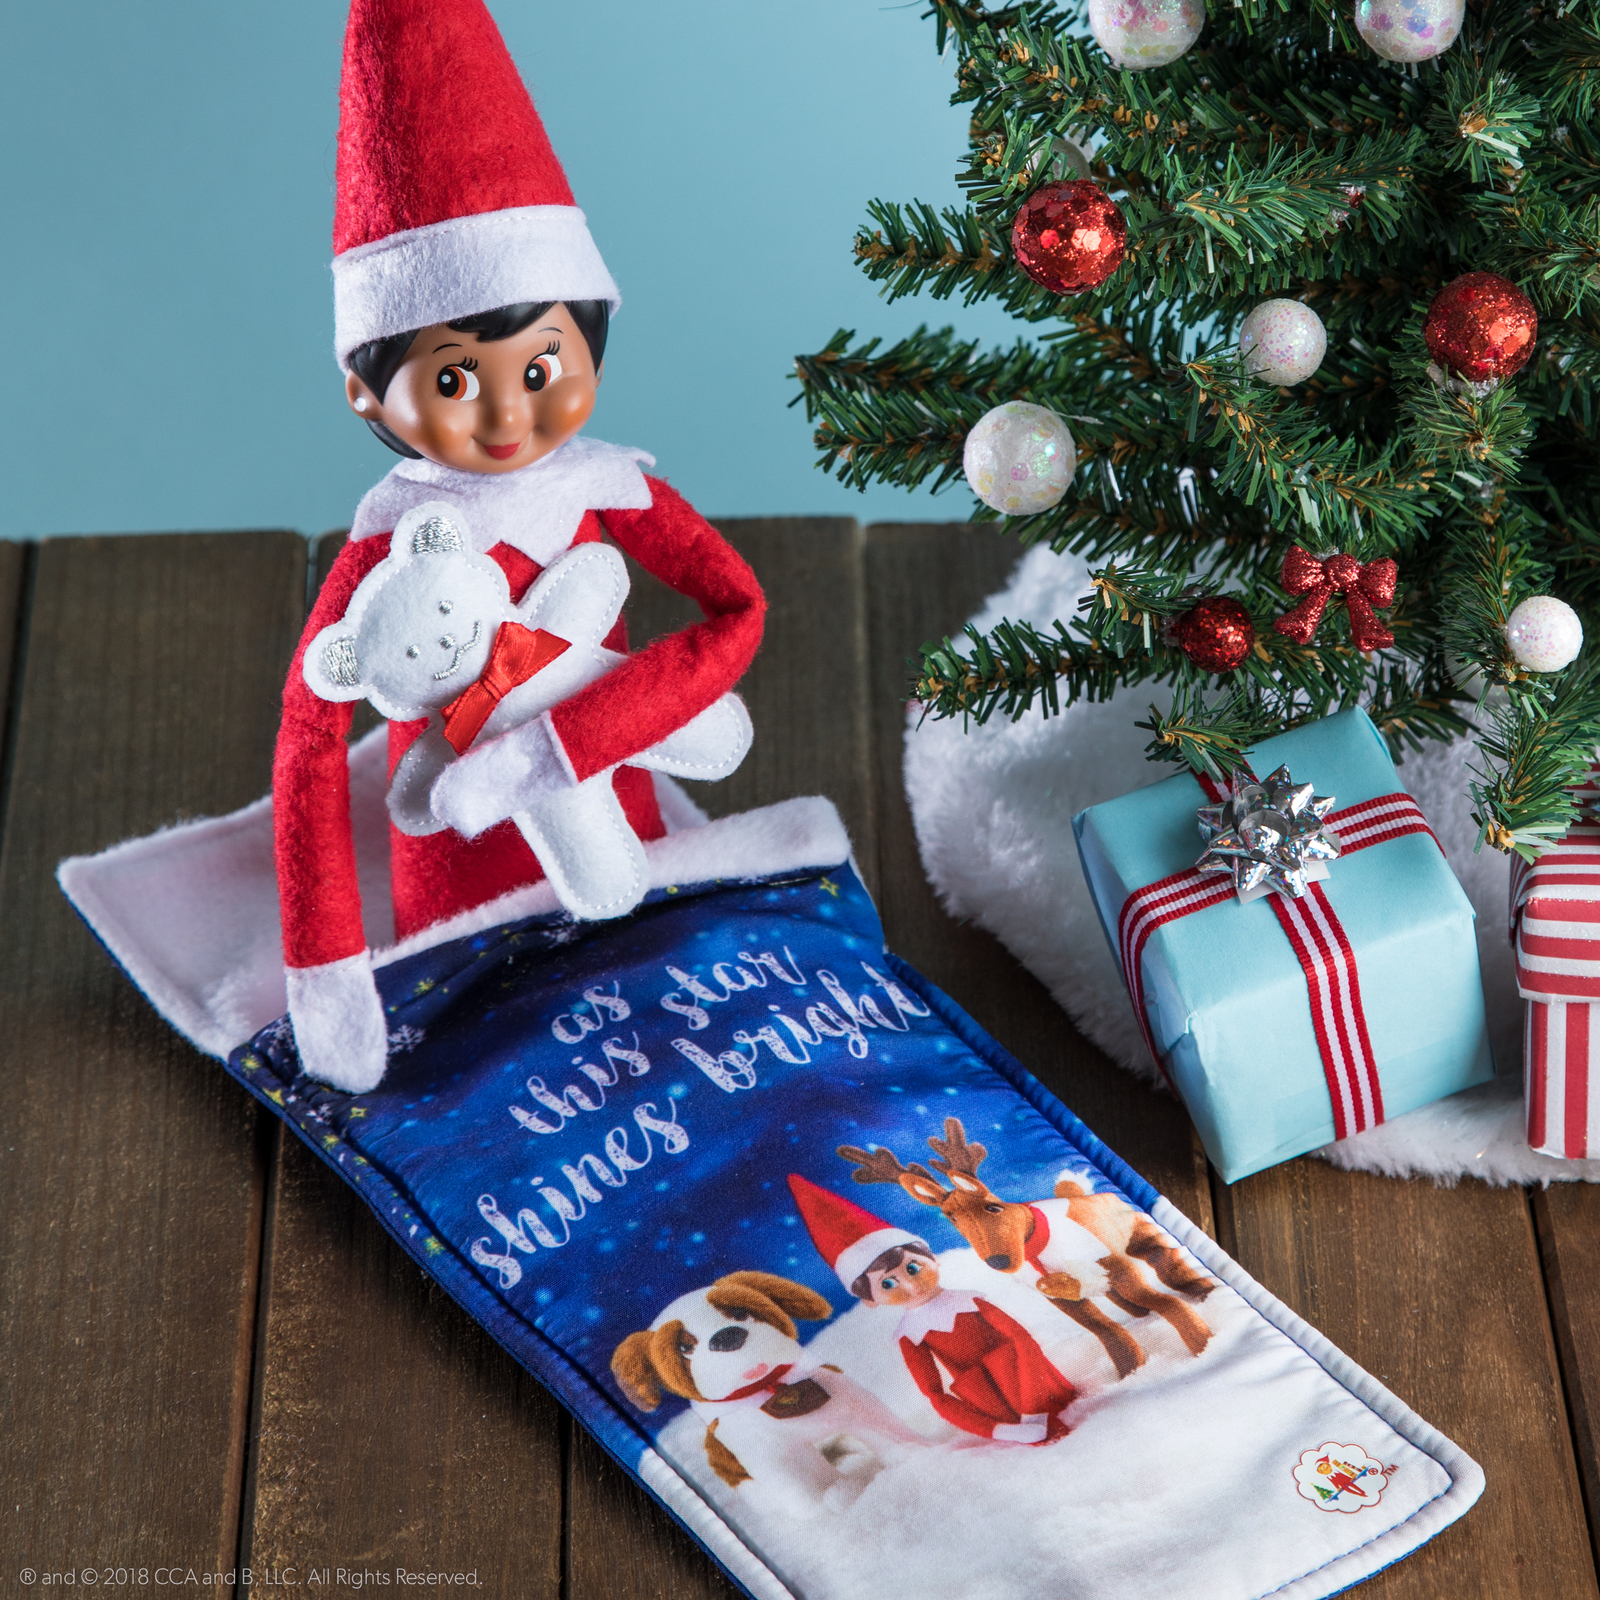 Elf on the Shelf: 2018 Couture - Slumber Set image